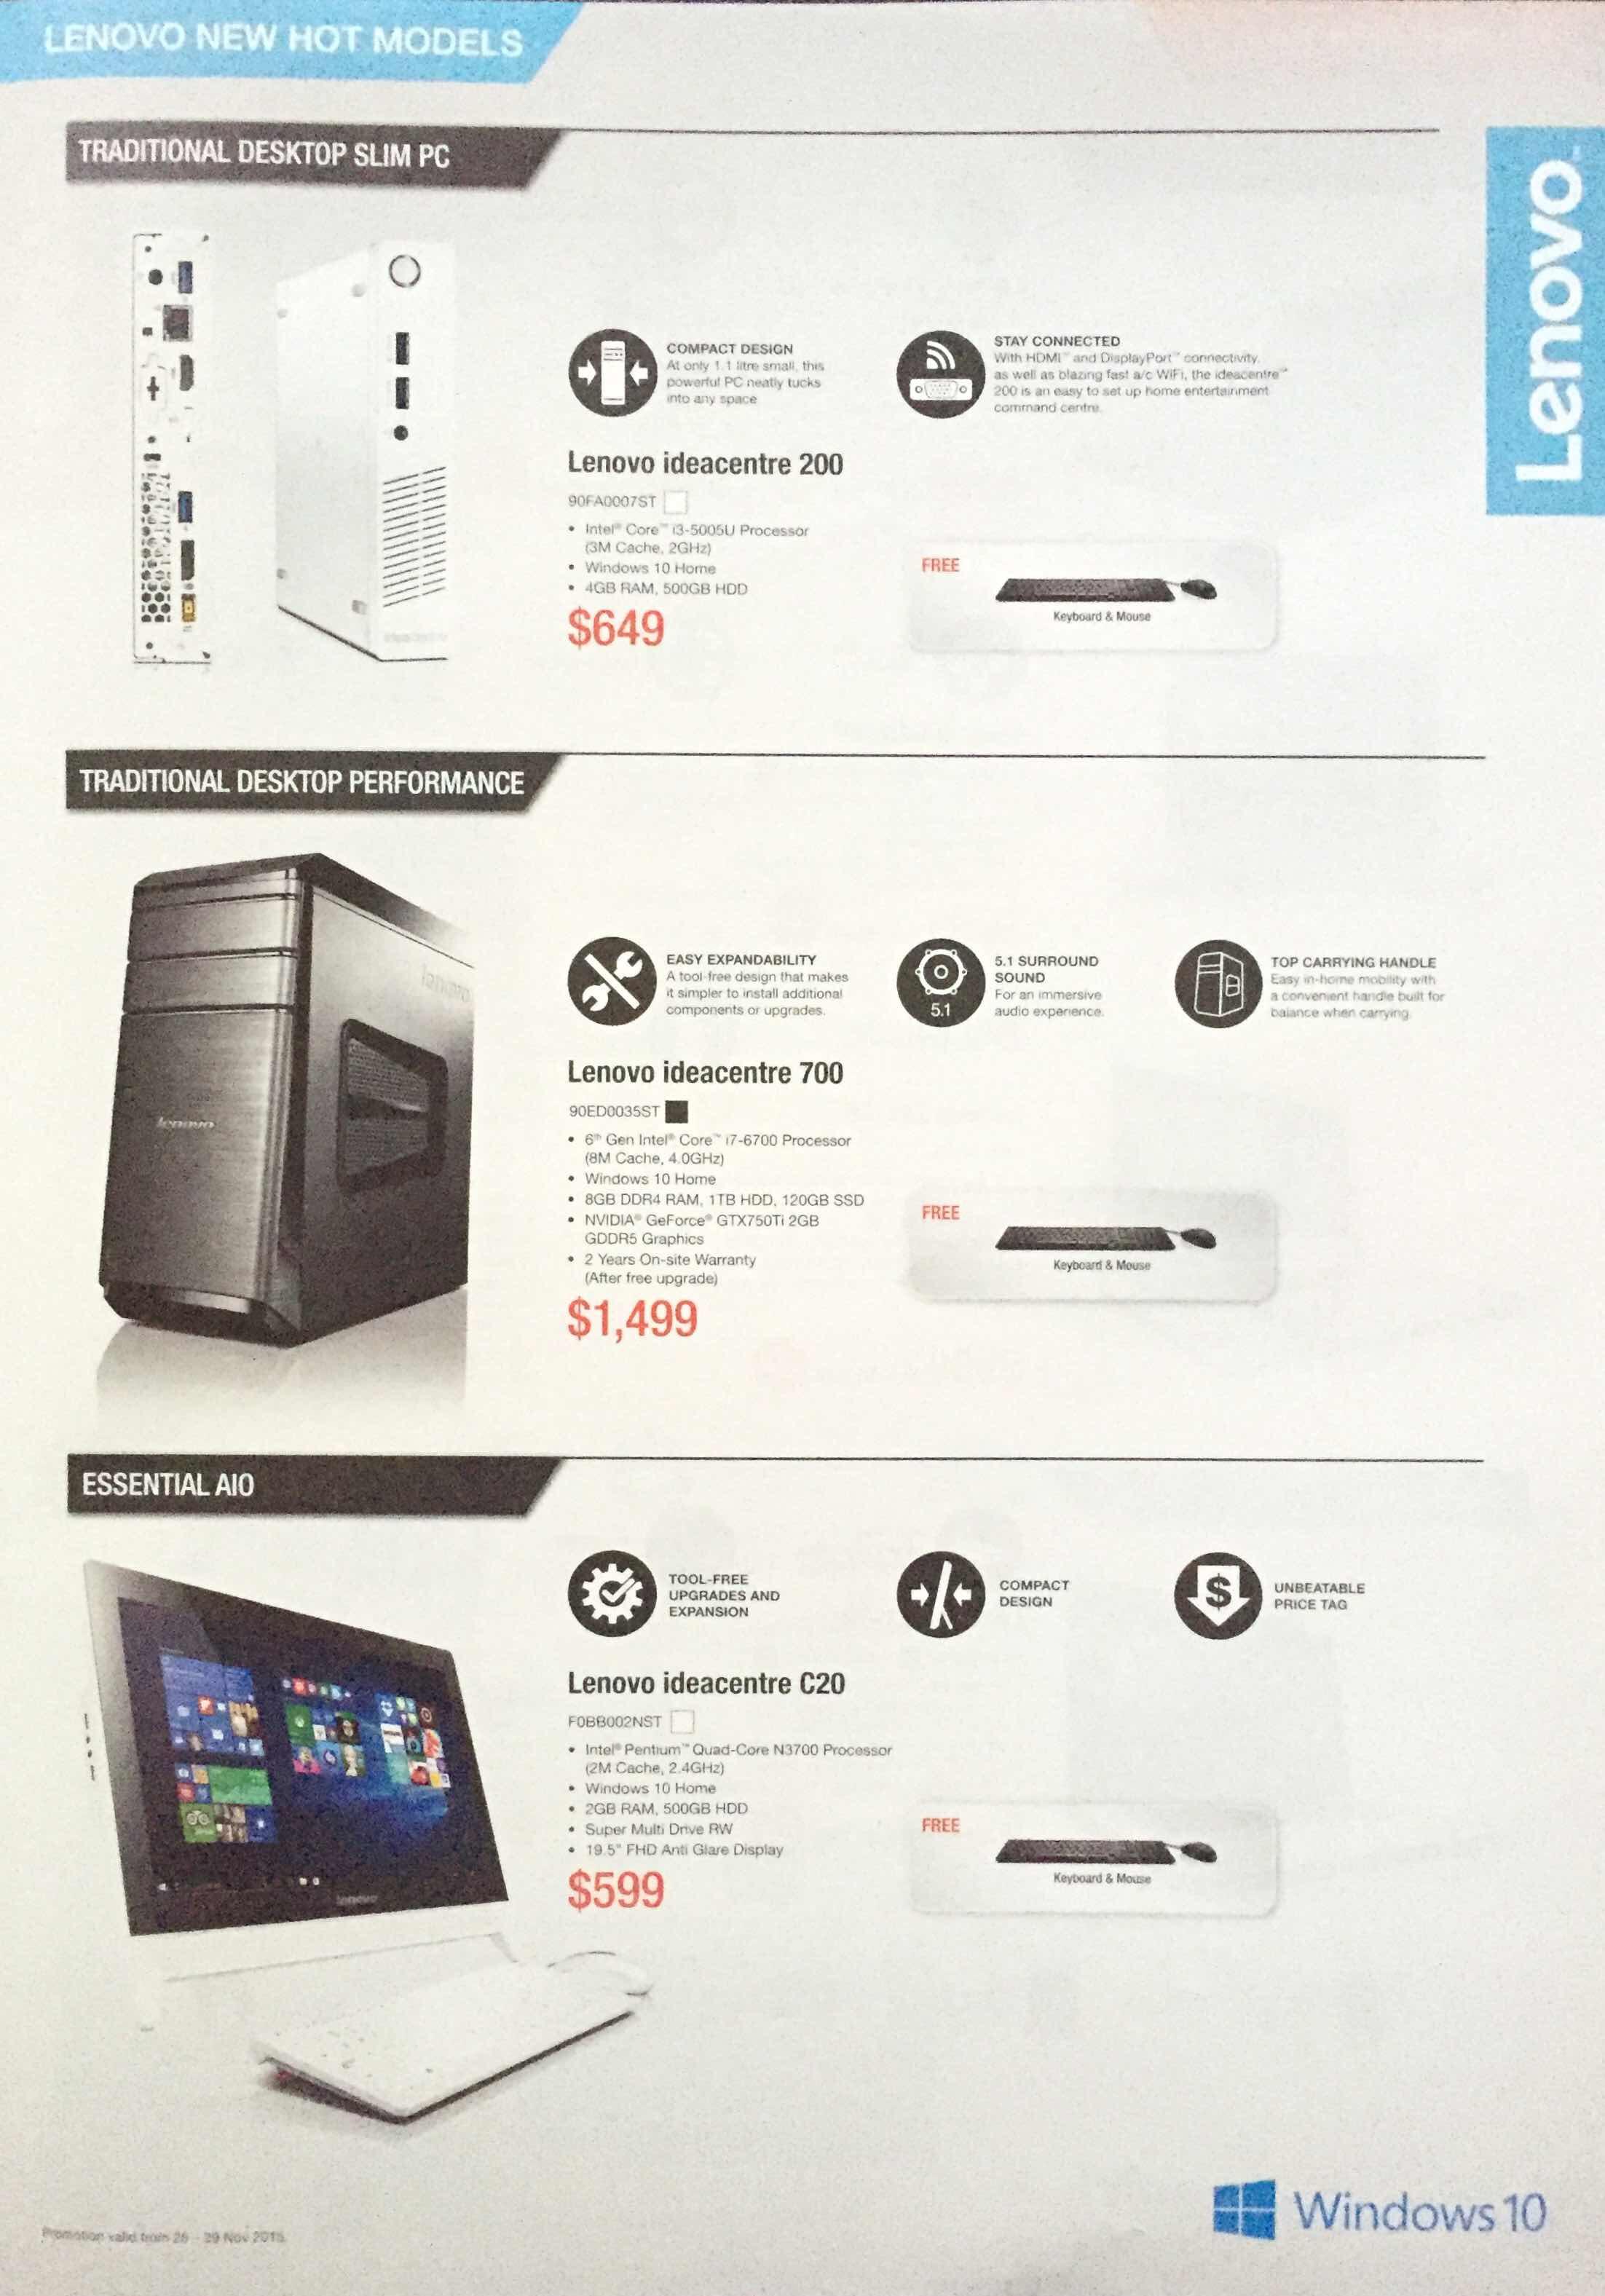 Lenovo SITEX 2015 - pg7 - LENOVO NEW HOT MODELS